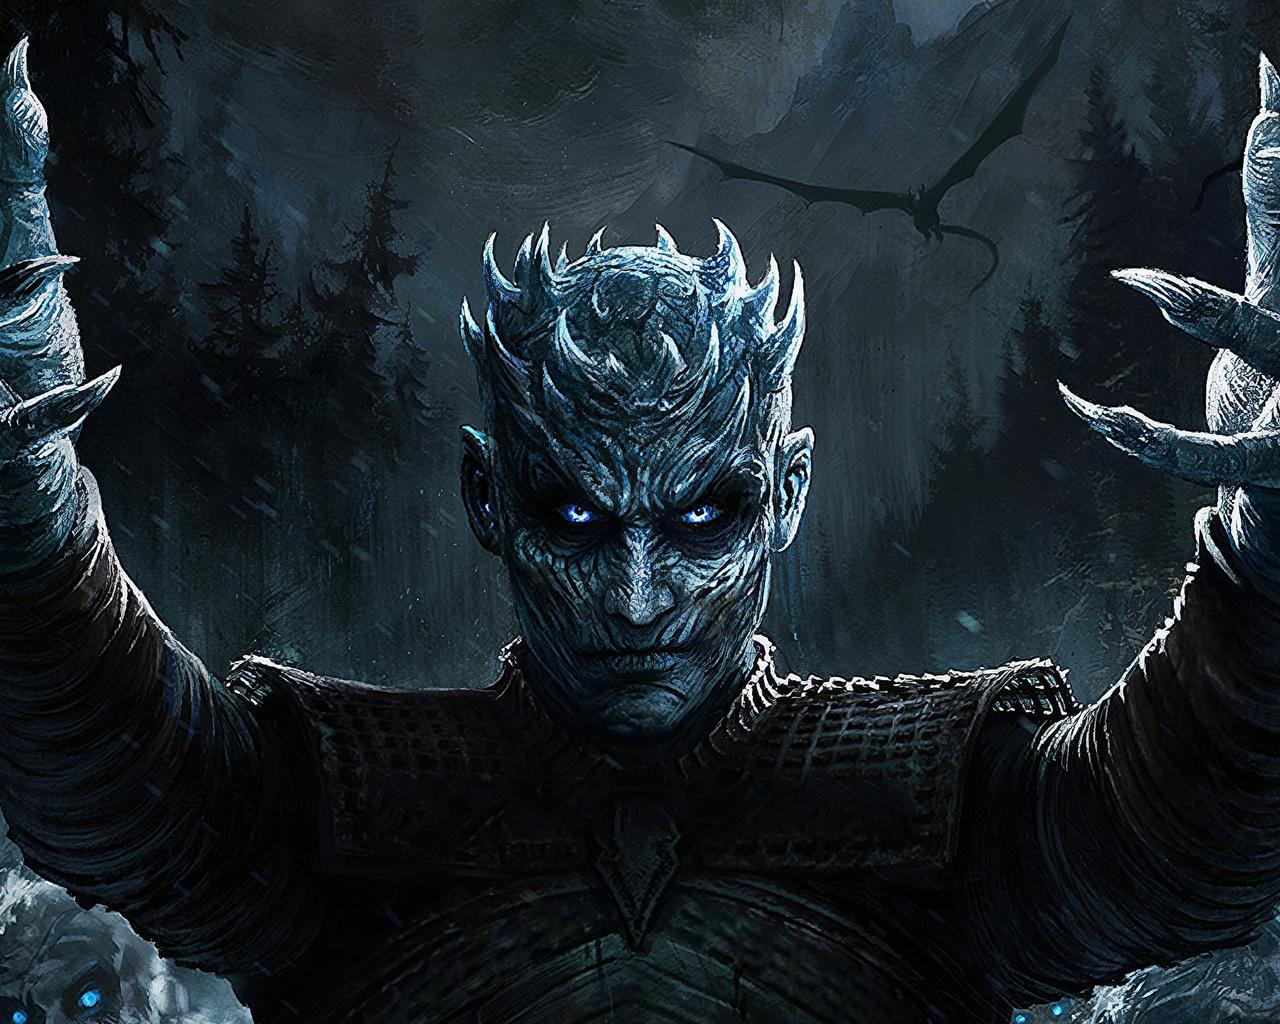 1280x1024 Night King Game Of Thrones Season 8 Art 1280x1024